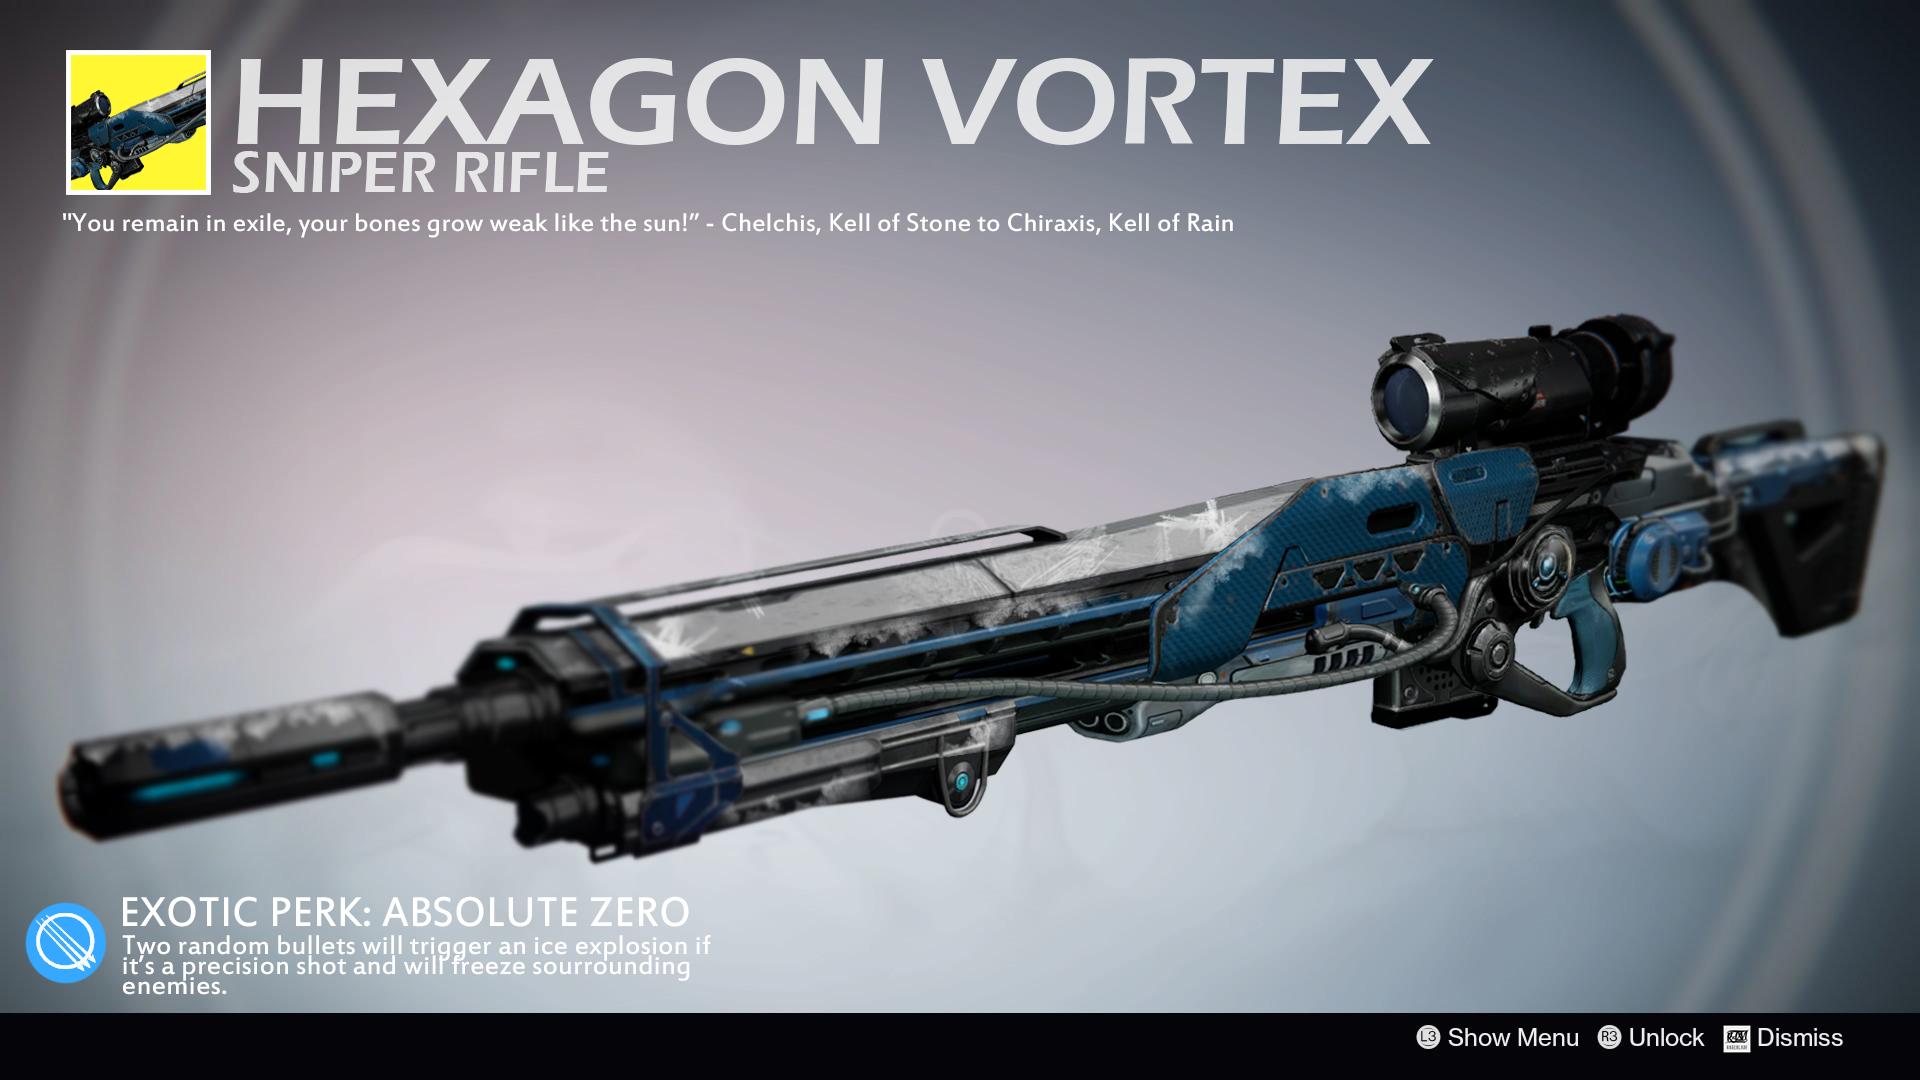 Drawn shotgun sniper rifle Rageblade66 Shell Vortex Hexagon Sniper